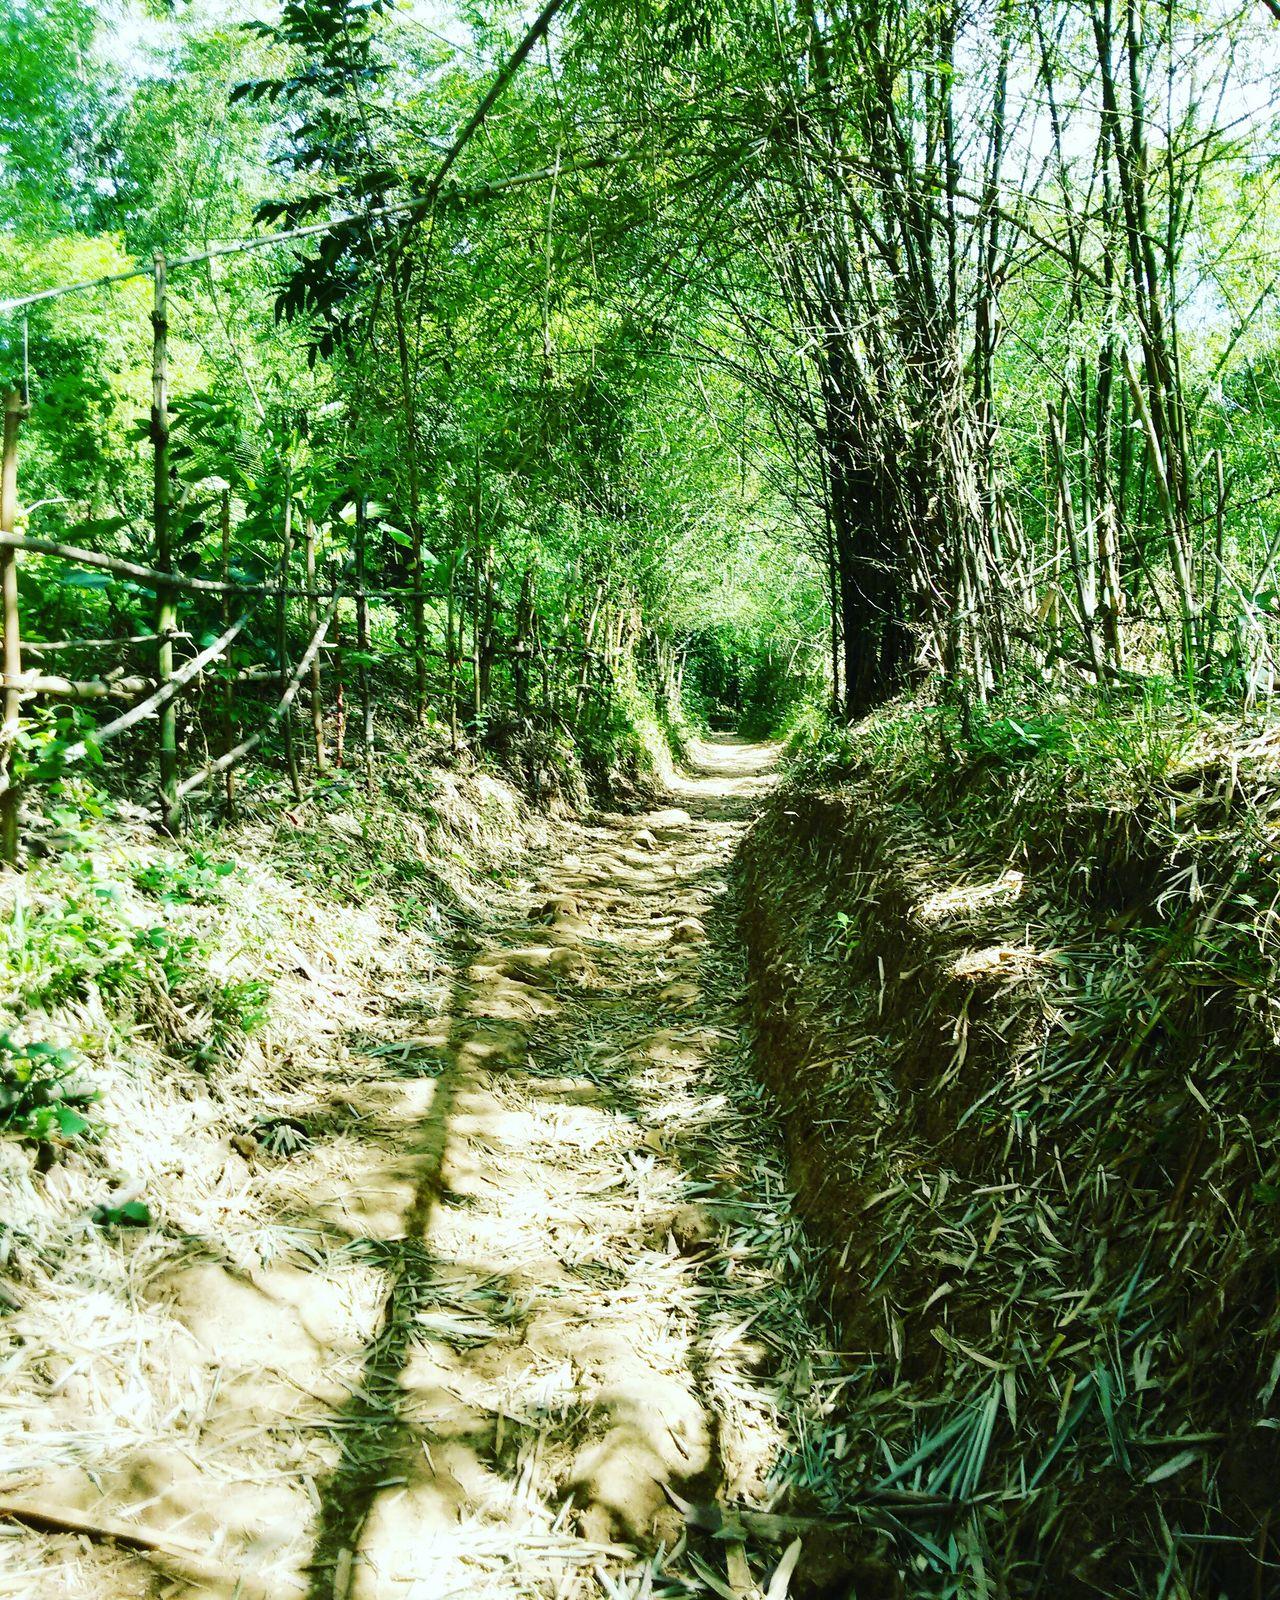 Grass Outdoors Nature Day TravelPhilippines Adventure Trekking